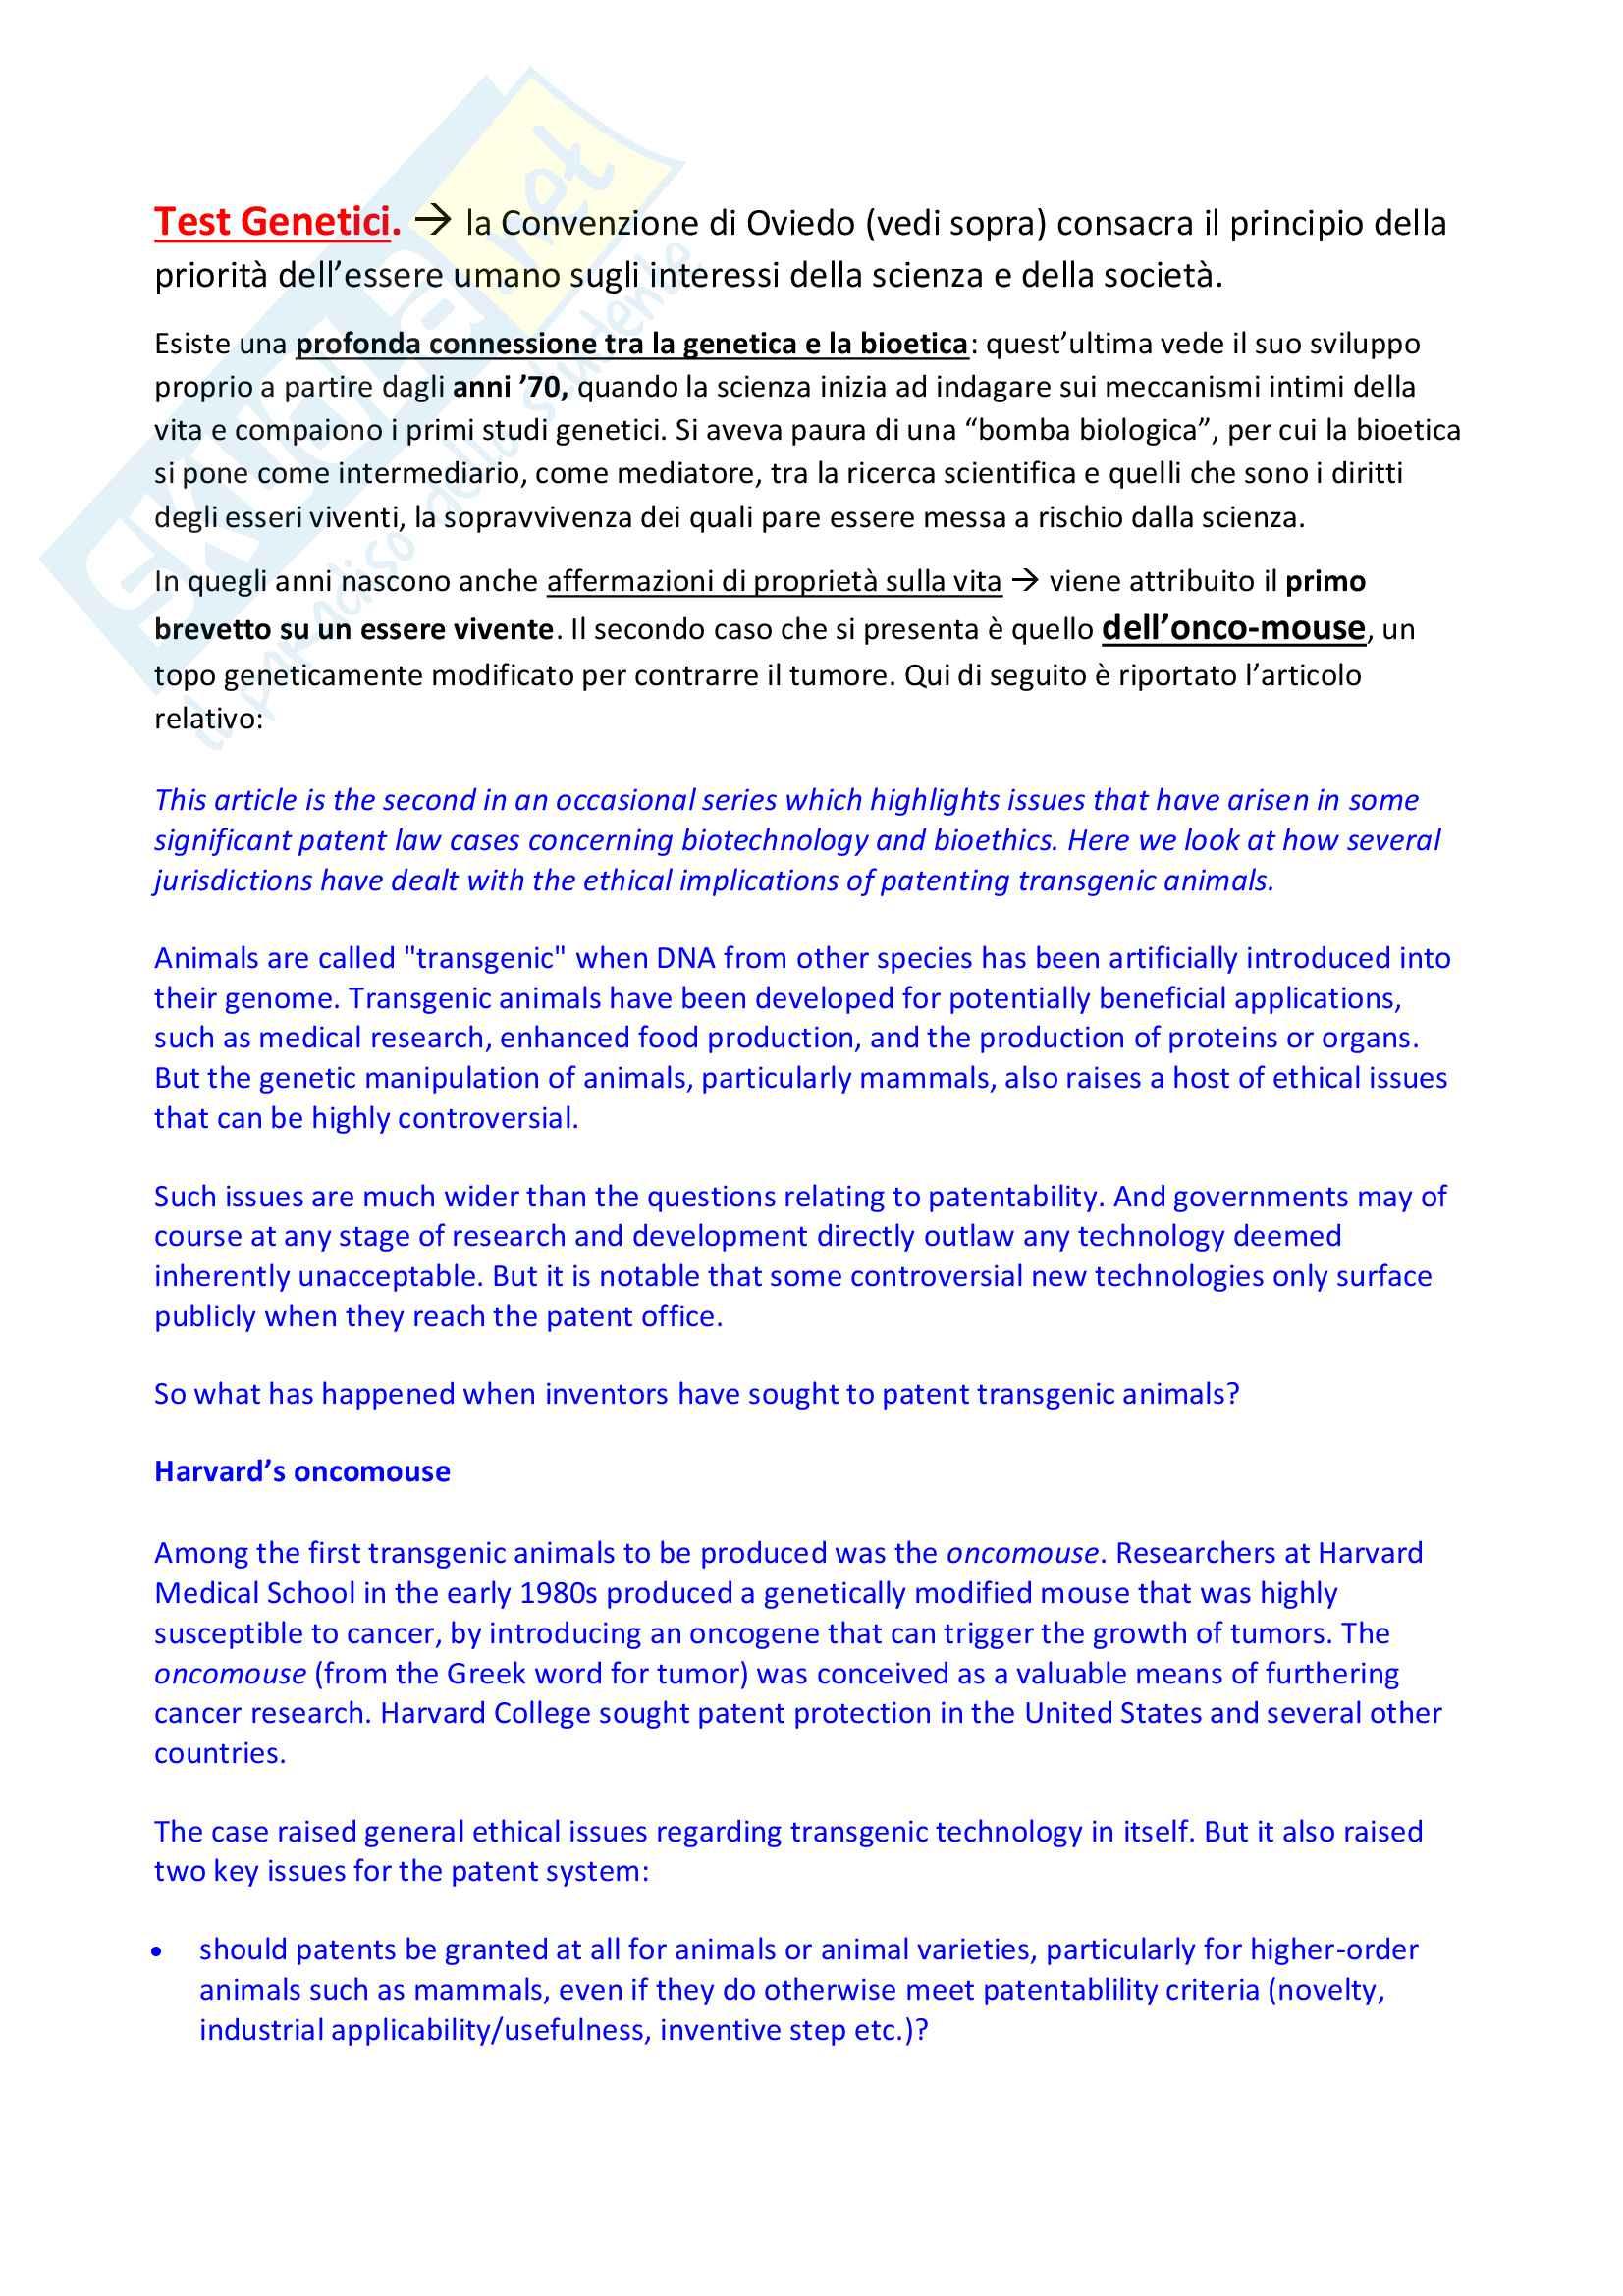 Bioetica 2 principi, applicazioni, sperimentazione animale, ivg, pma